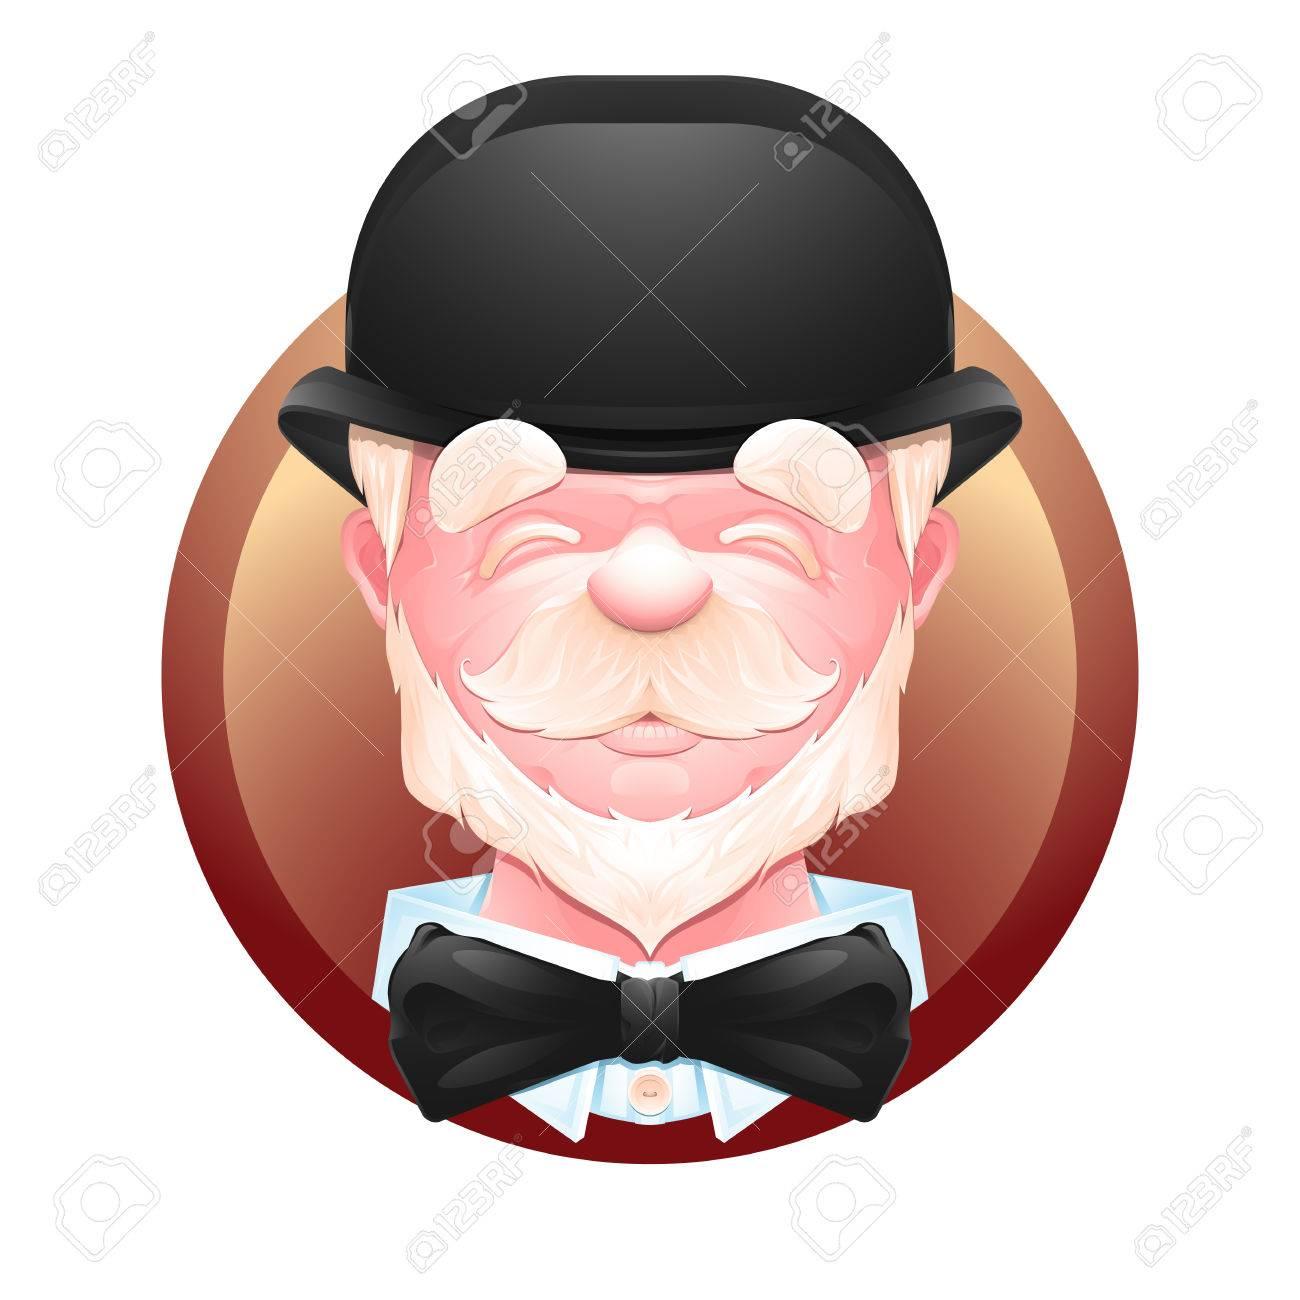 Closeup Portrait Of An Cheerful Elderly Gentleman In A Bowler